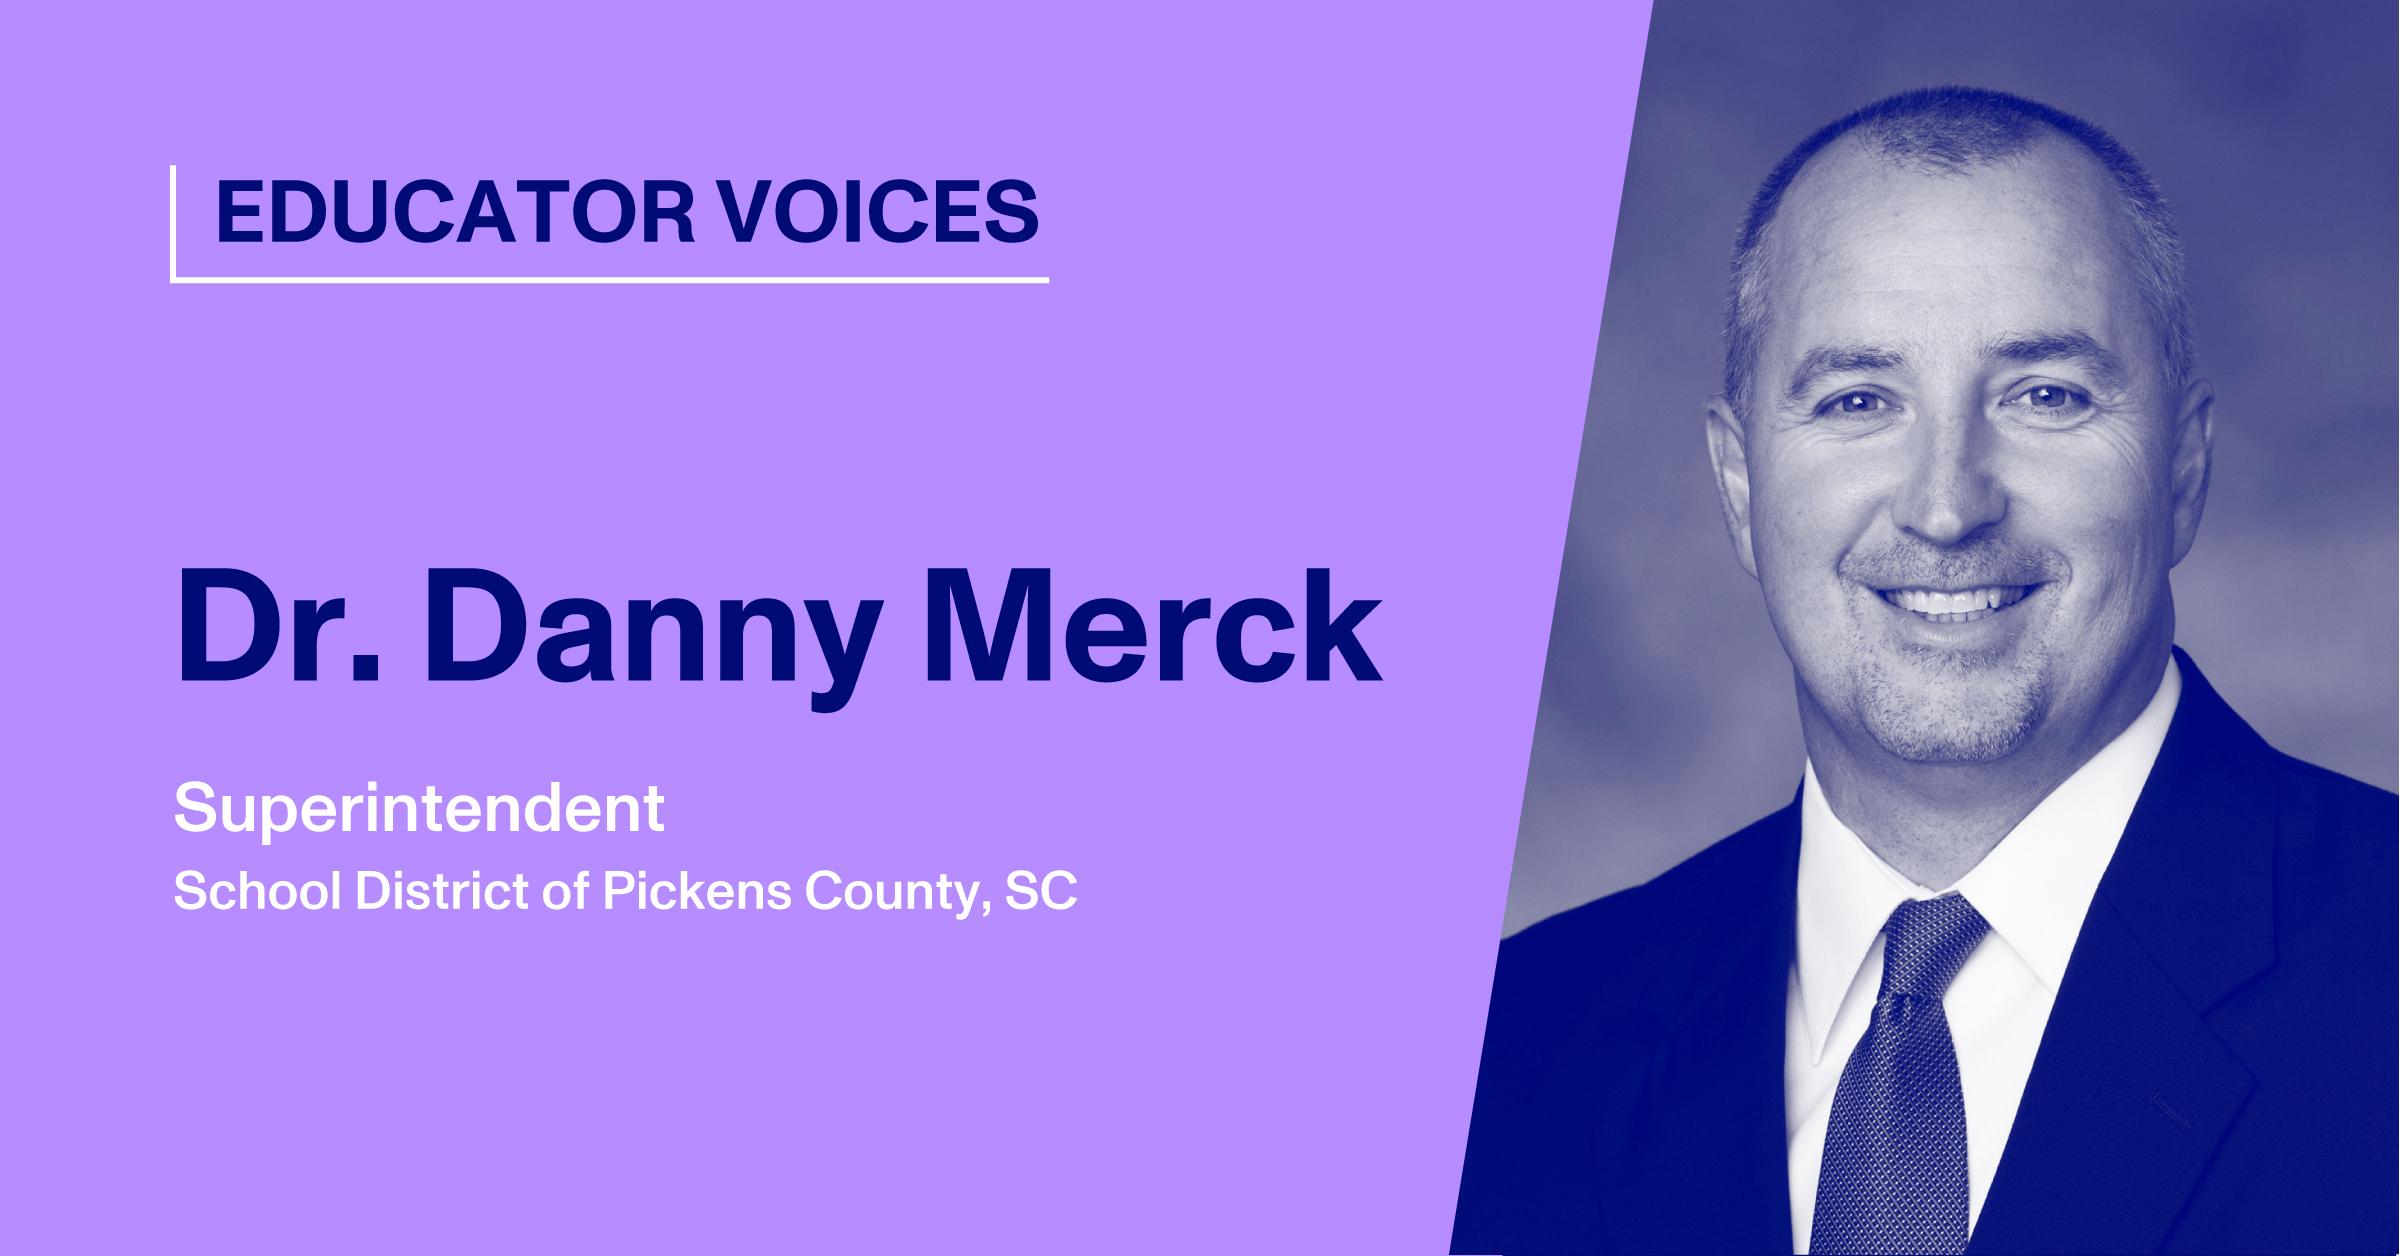 Blog Thumbnail with Headshot of Dr. Danny Merck